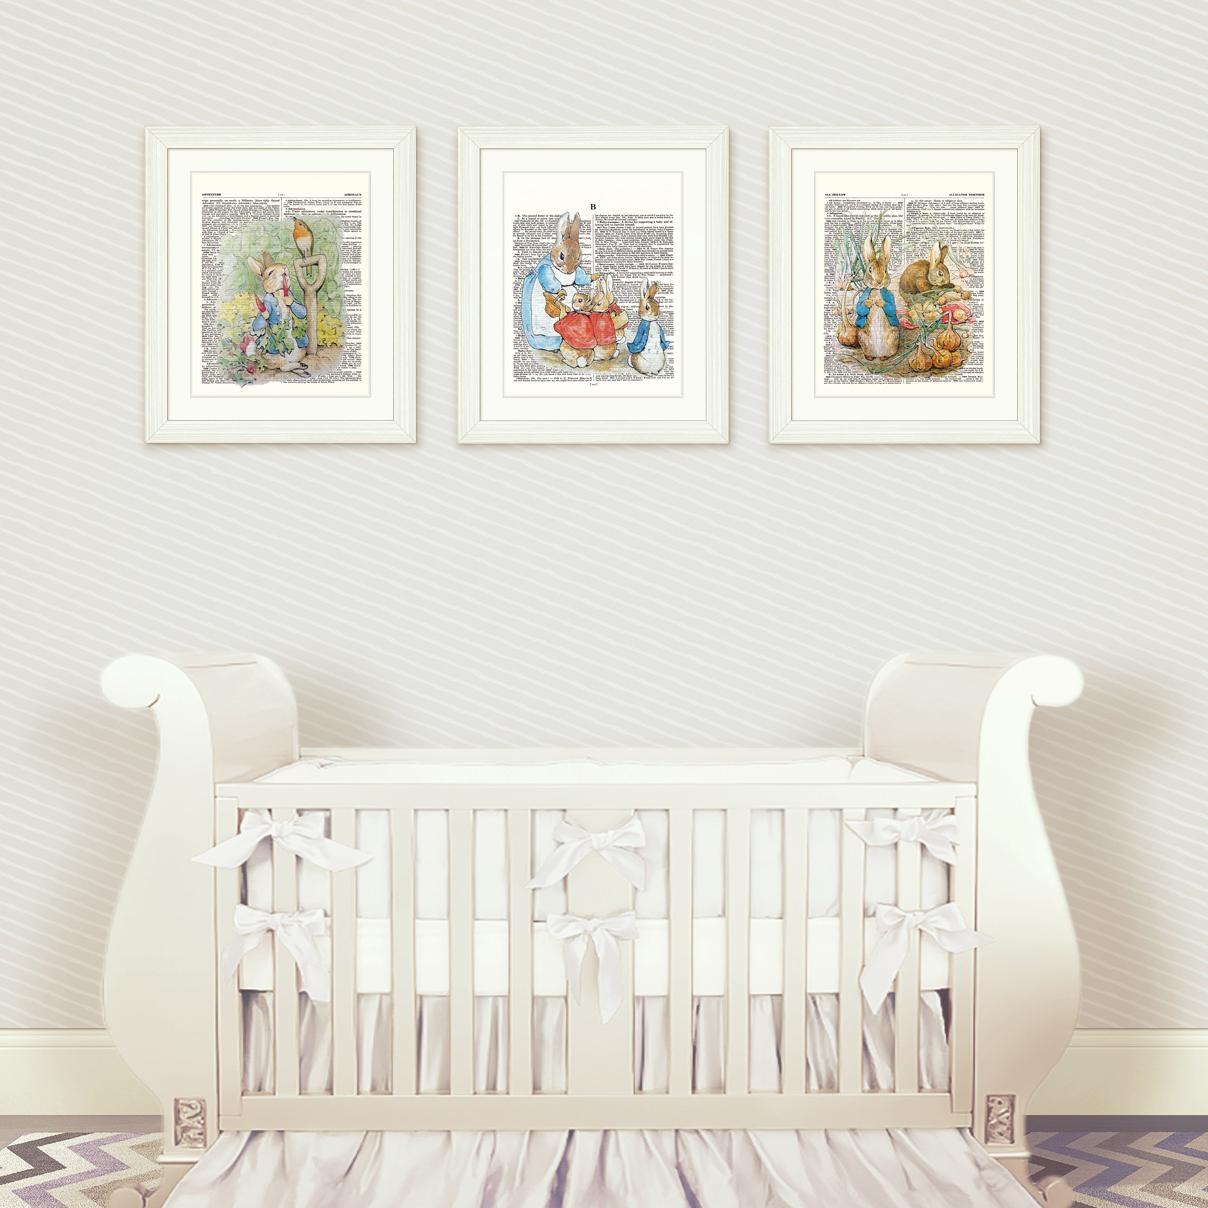 Peter Rabbit Nursery Wall Art Set 1 – Artsy Pumpkin In Peter Rabbit Wall Art (Image 10 of 20)